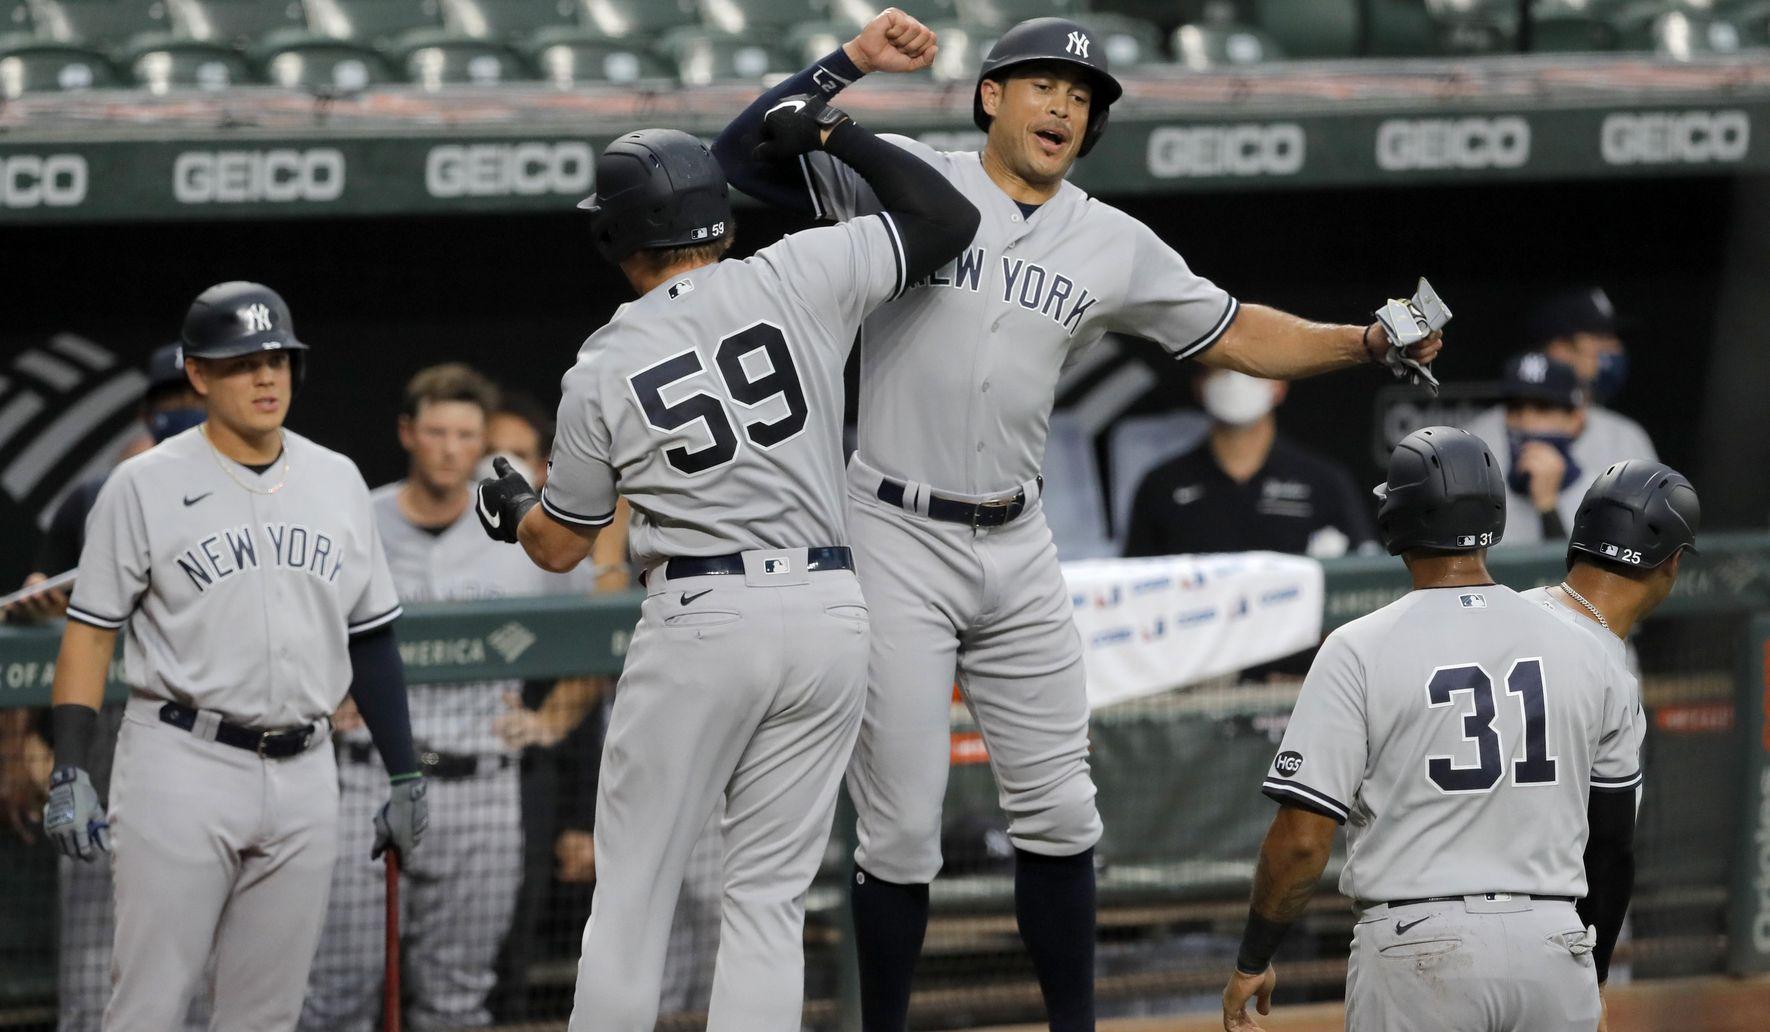 Yankees_orioles_baseball_63750_c0-208-4979-3111_s1770x1032